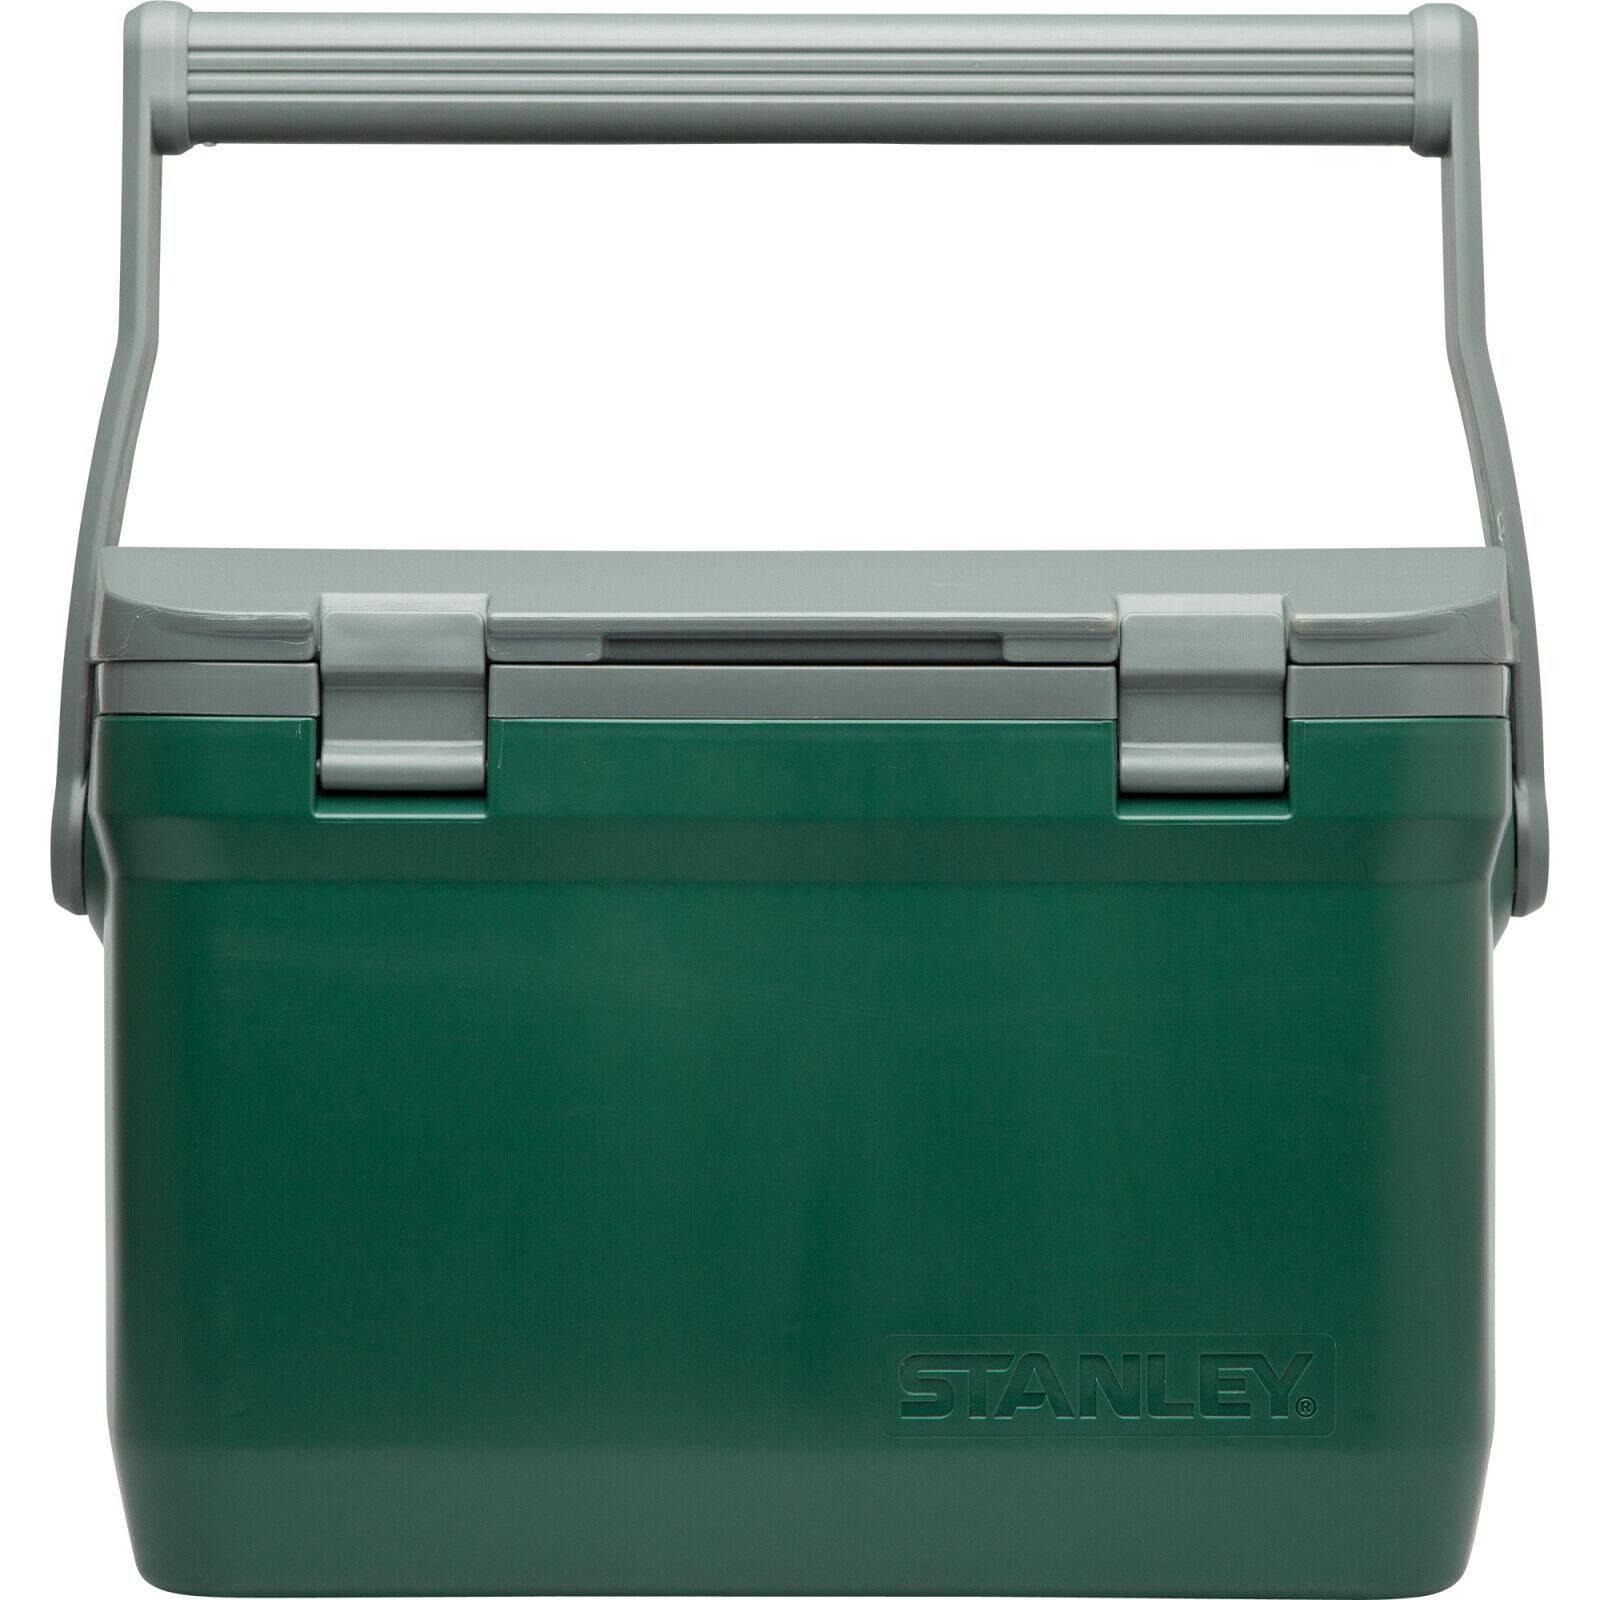 Stanley Adventure Cooler 16QT GREEN 16 QUART Unisex Adult